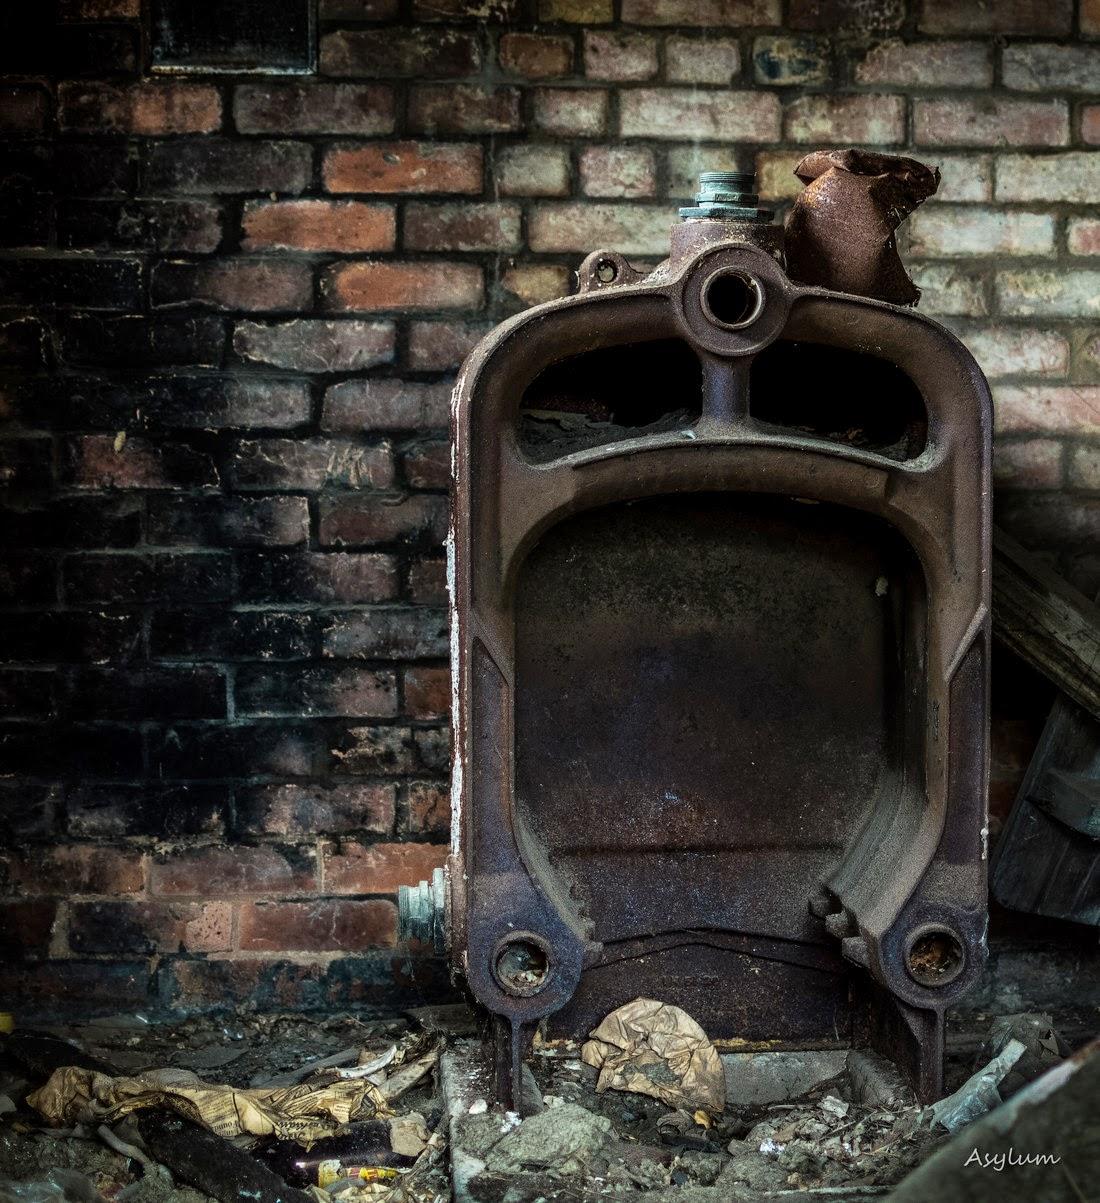 Brisbane Urbex: Abandoned Mental Hospital & Asylum With No